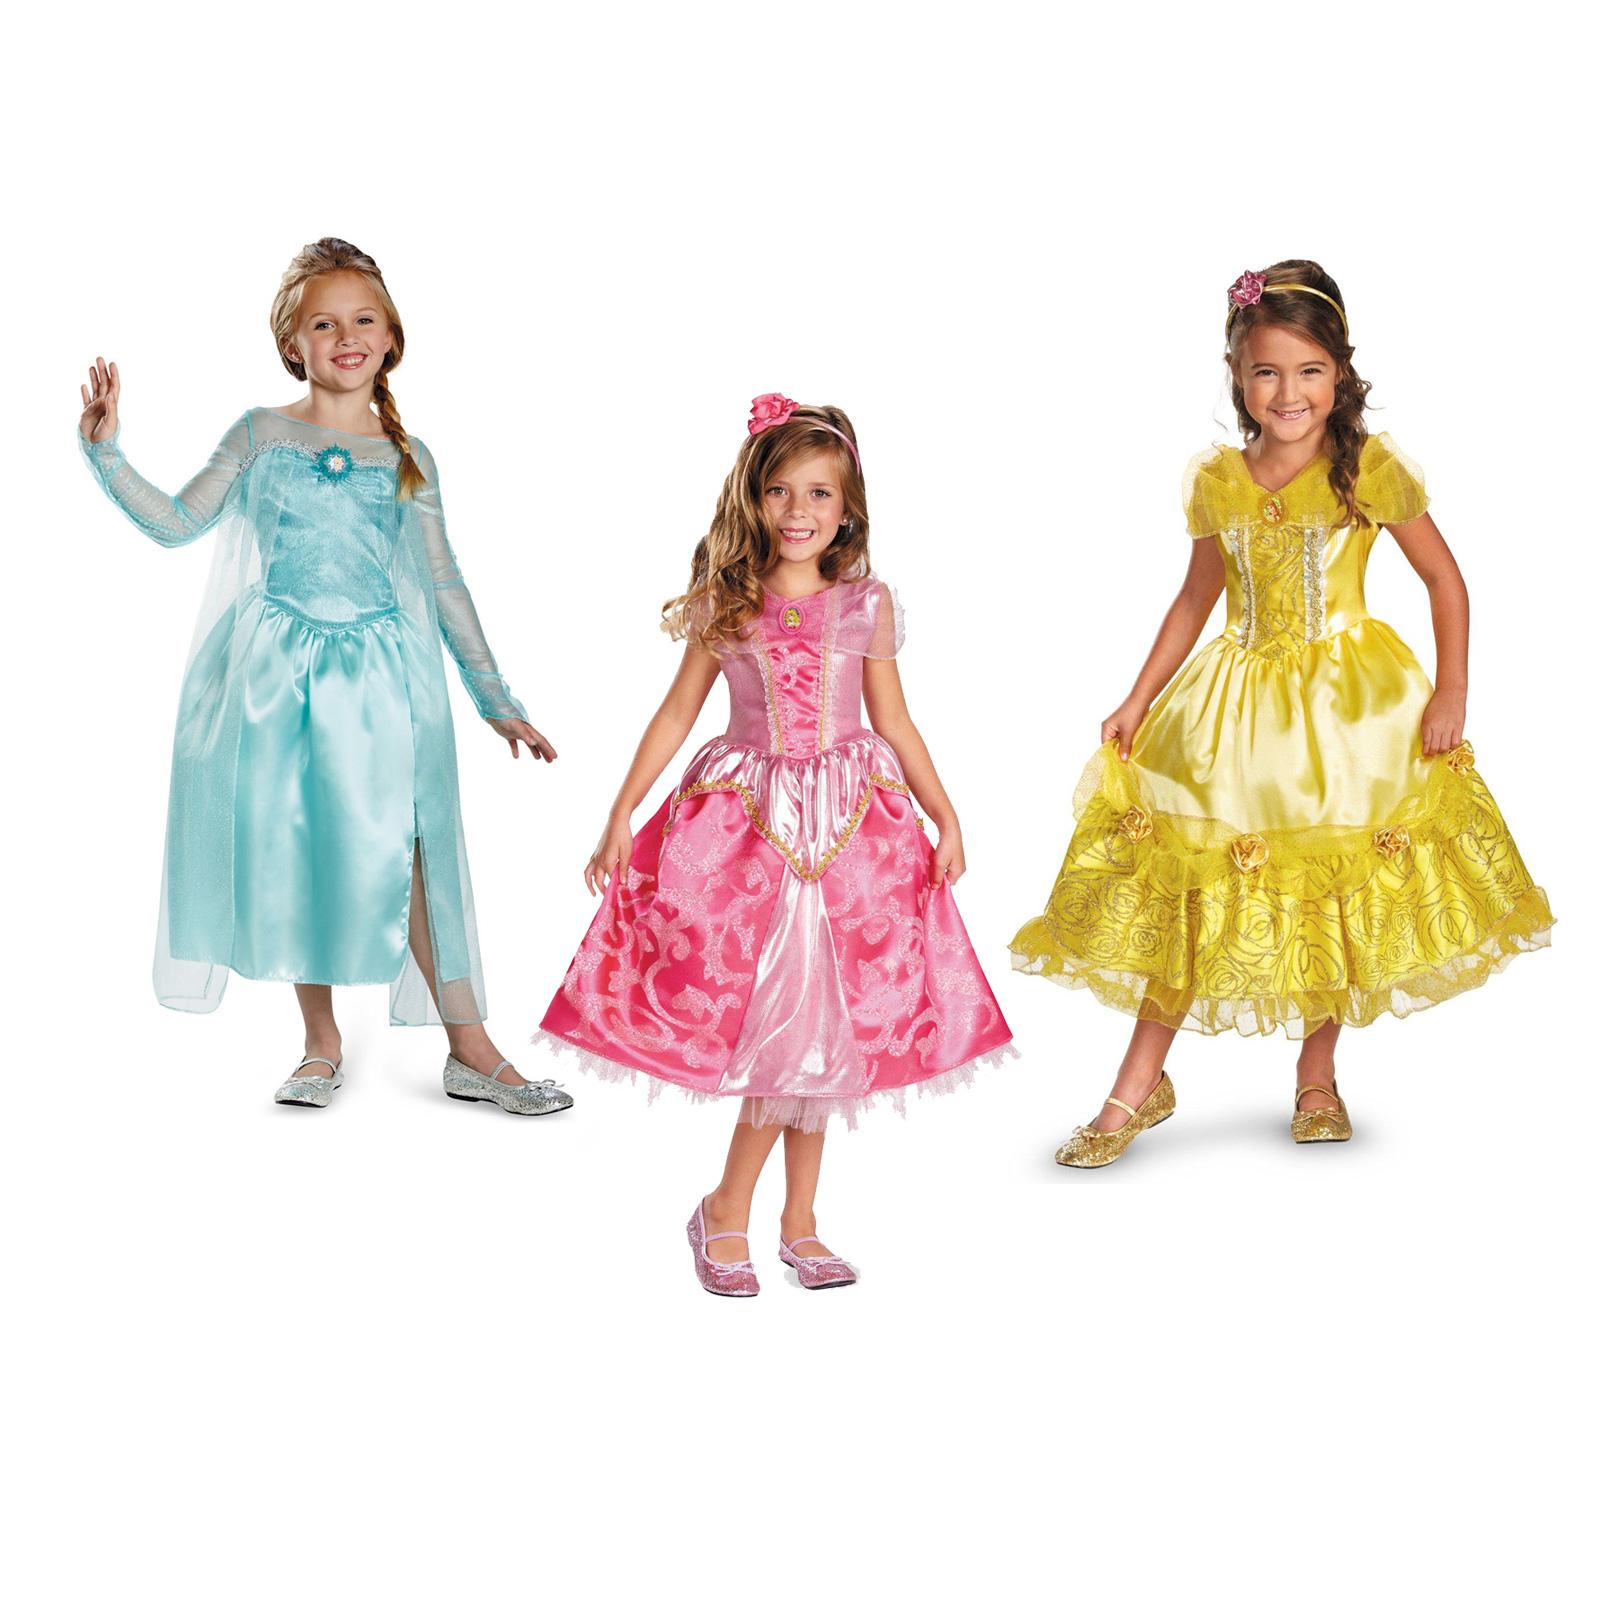 Dress up of princess - Dress Up Of Princess 1